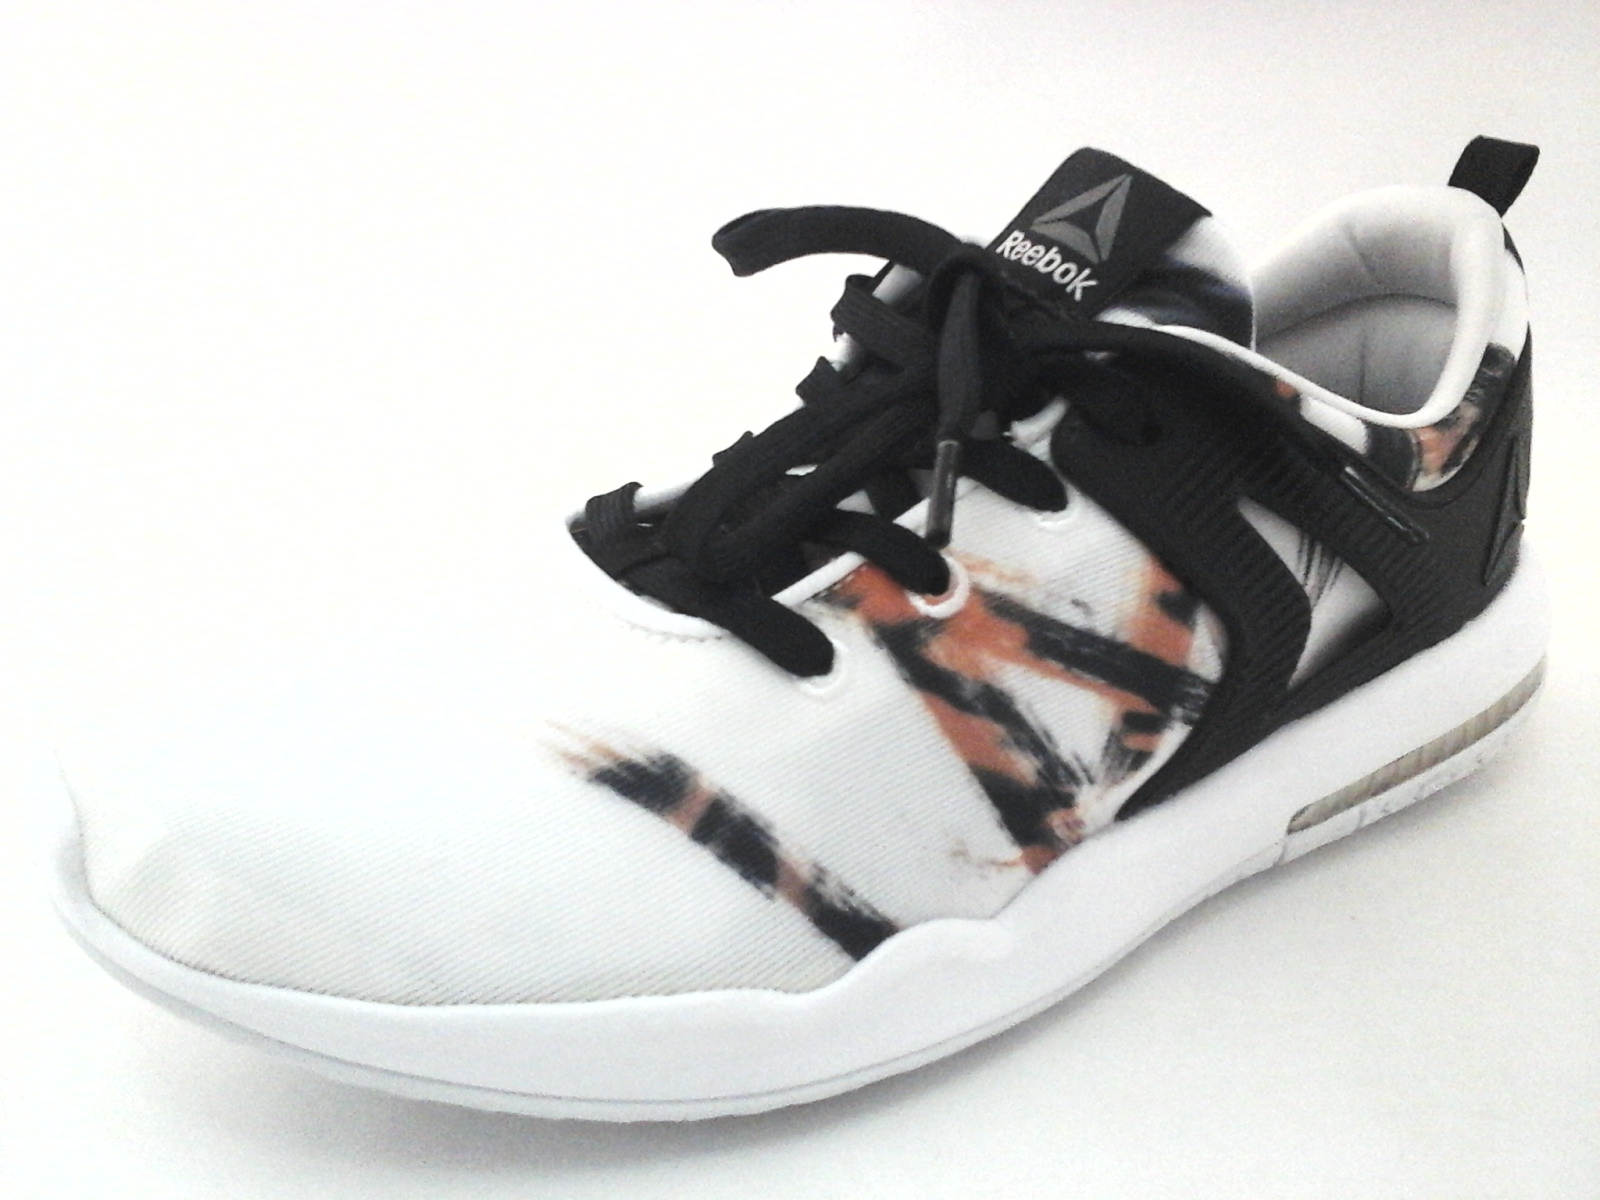 Details about Reebok Women s Hexalite X Glide Running Shoe Black White Coal  US 9.5 EU 40.5 New 6af6692d7